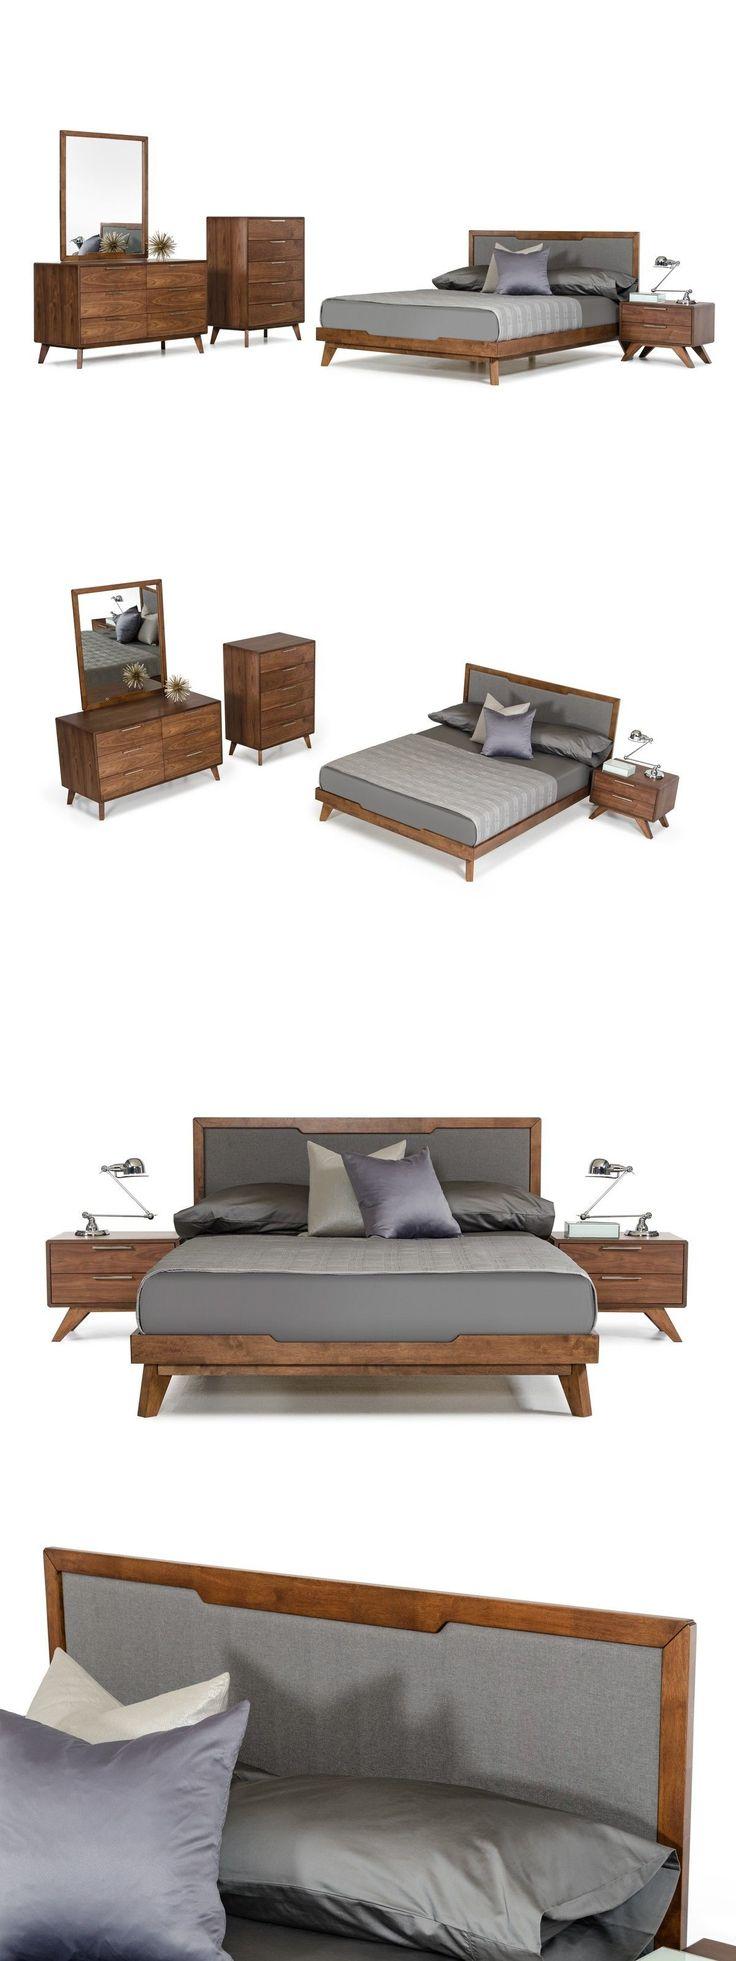 best 25+ buy bedroom set ideas on pinterest | built in bed, bed